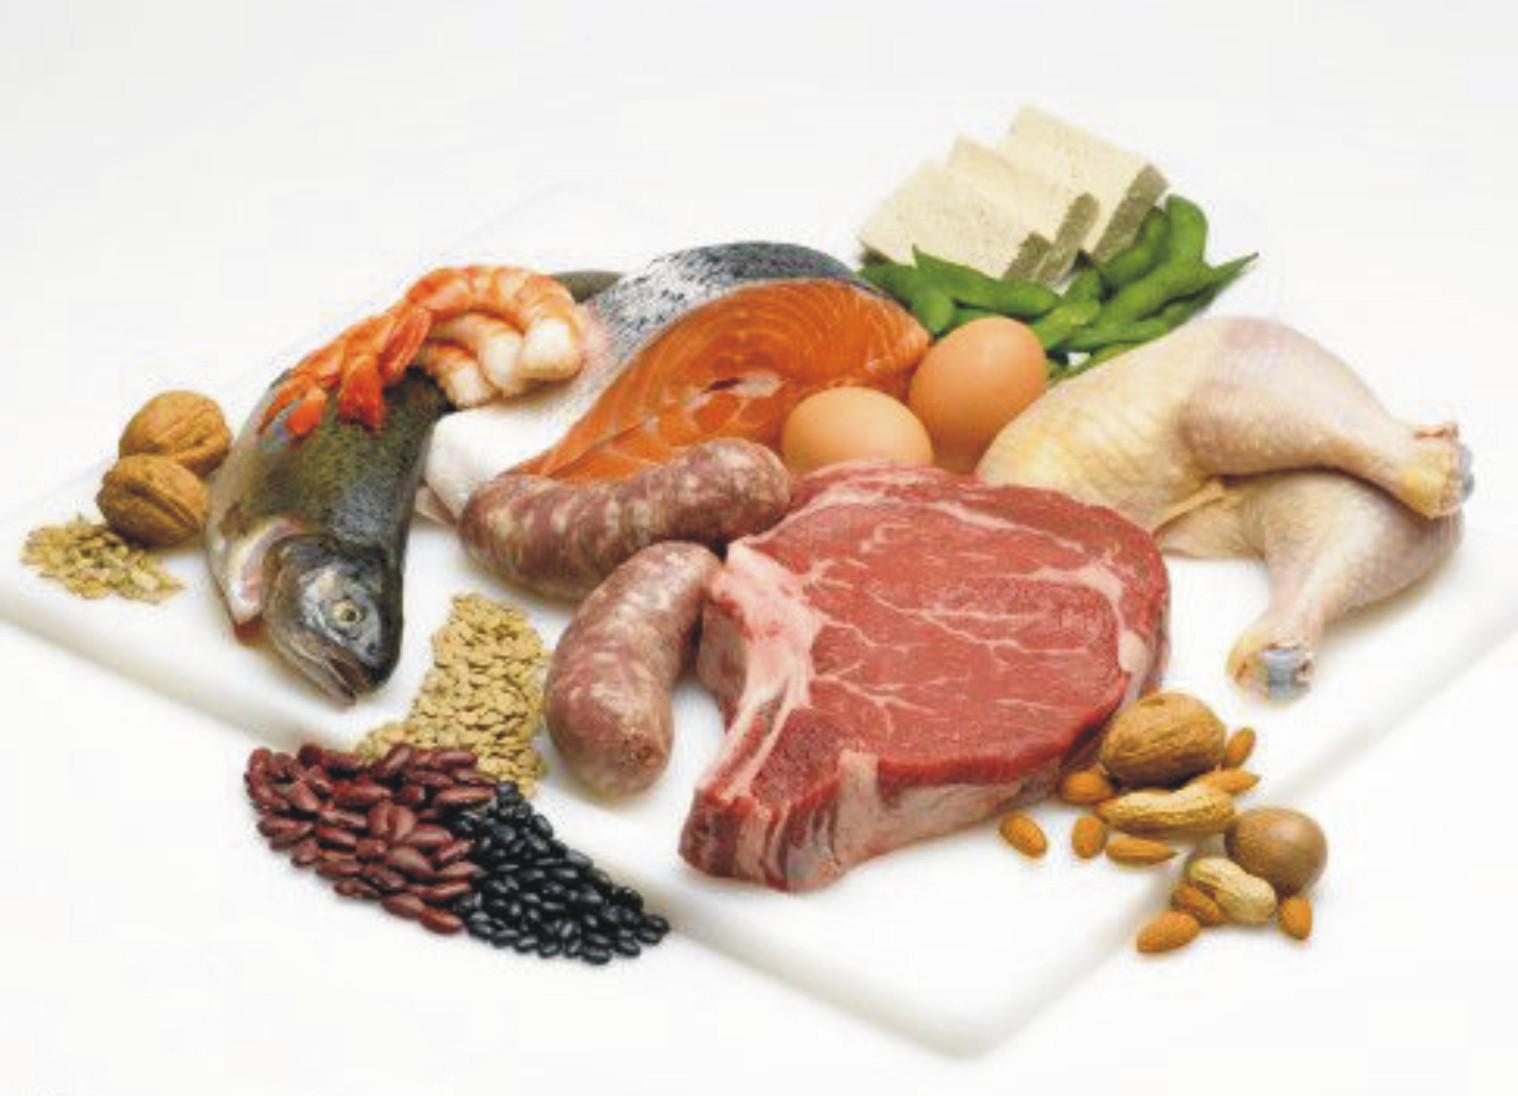 Food Good For Proteinuria